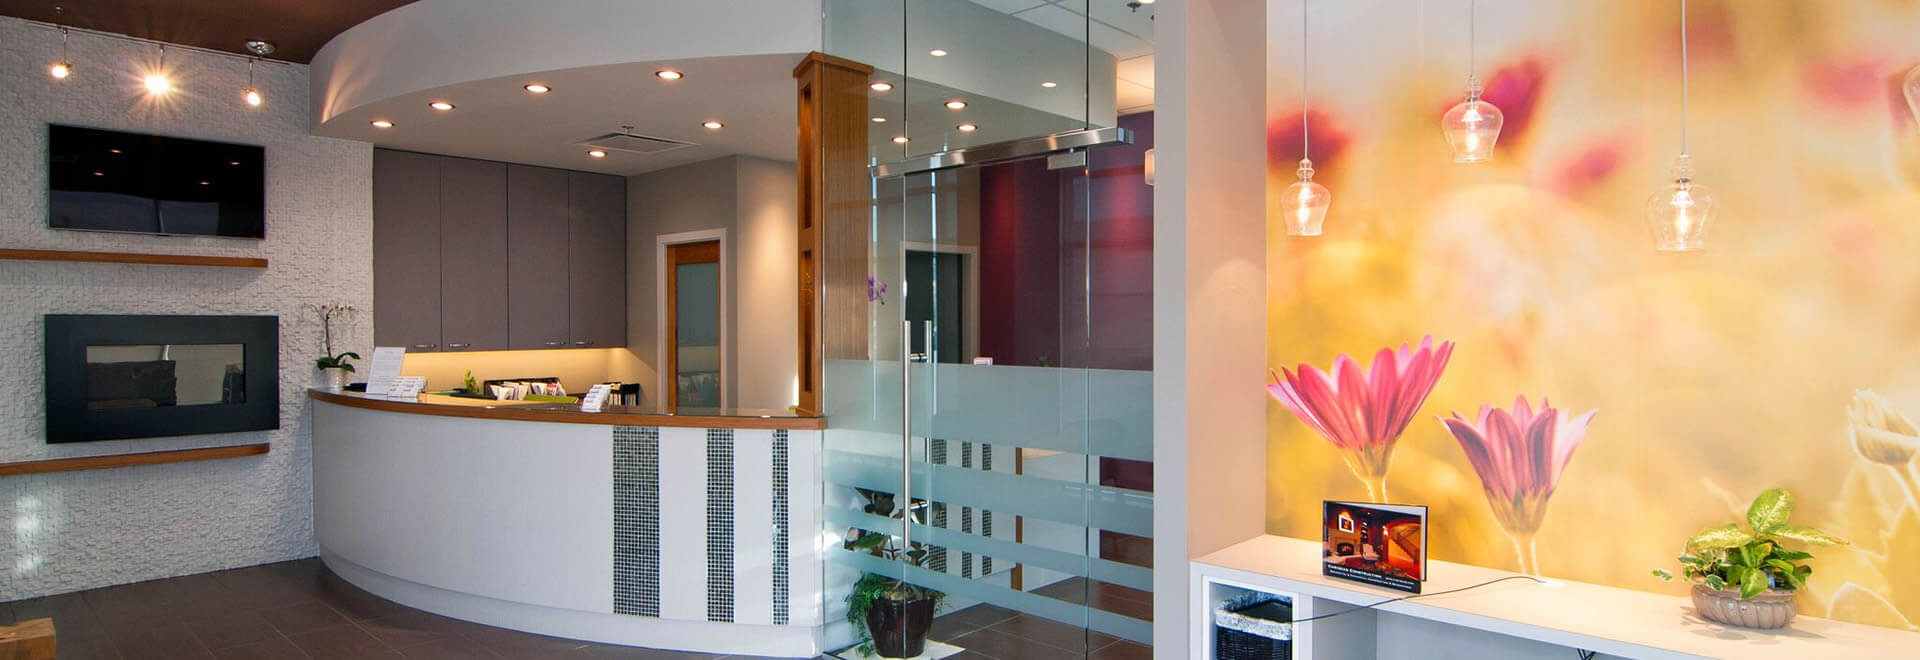 modern dentist for orthodontists, hygiene dentures and surgery westside dental centre kelowna bc